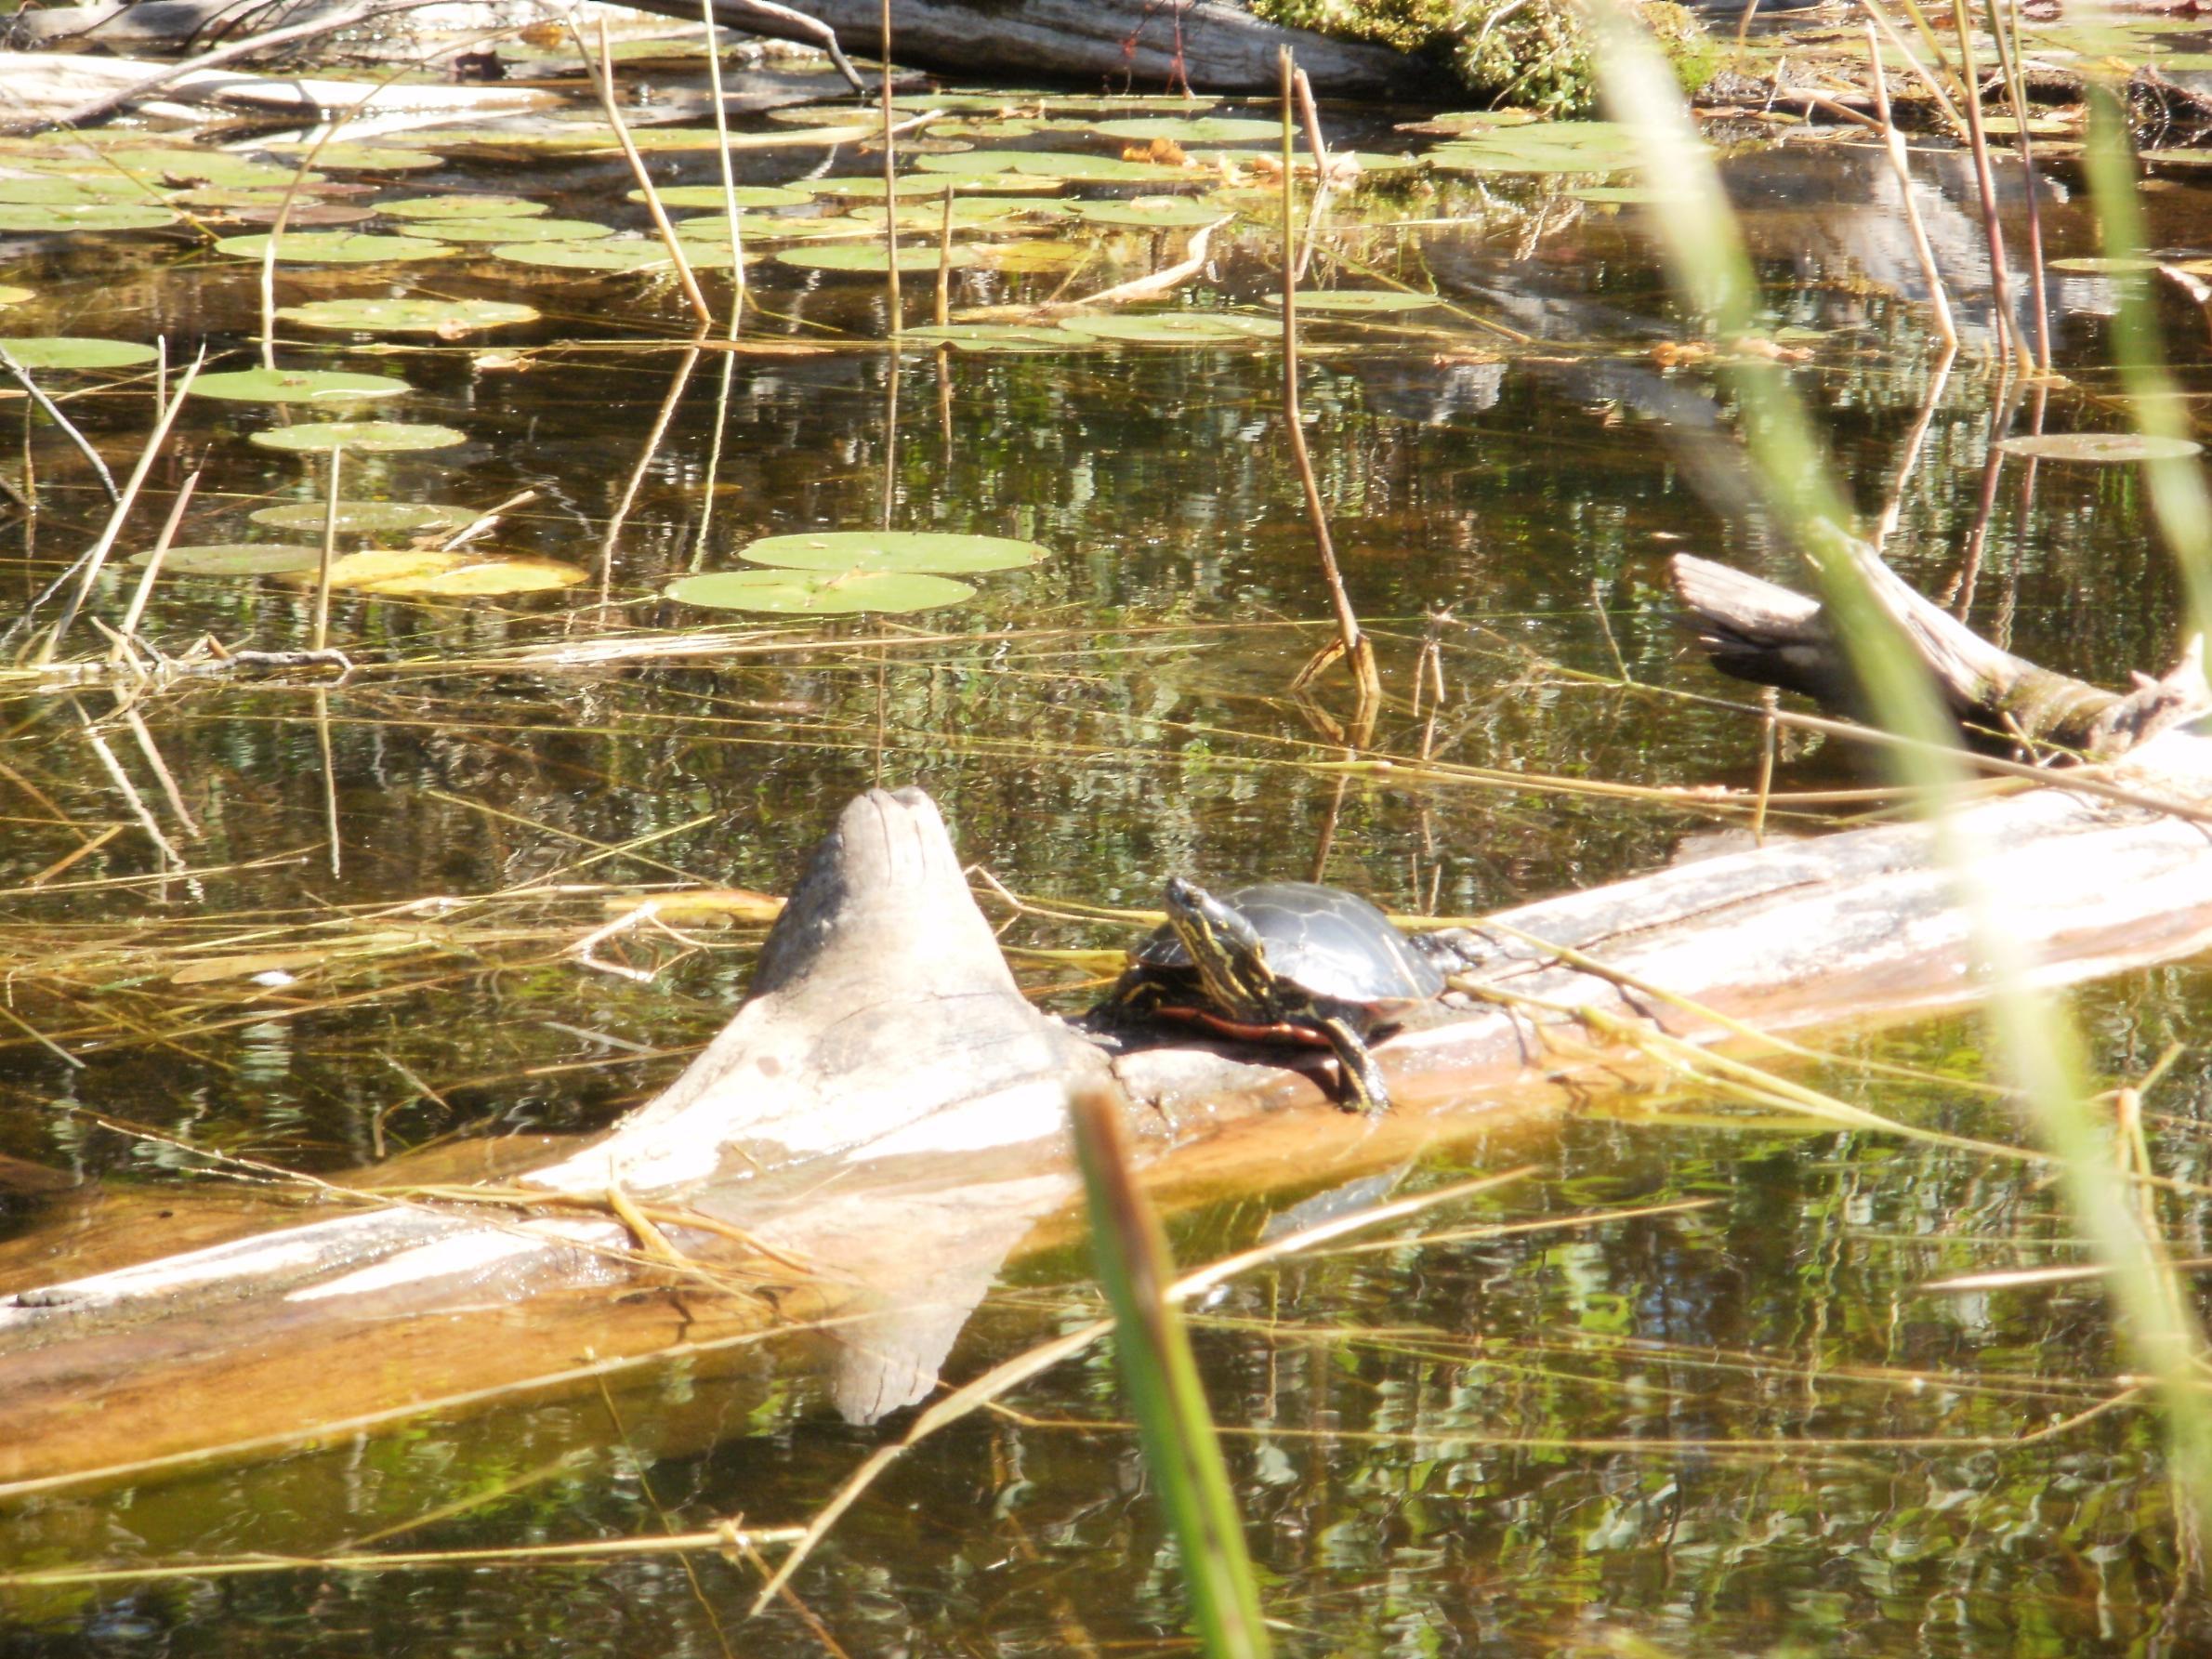 Turtle bathing